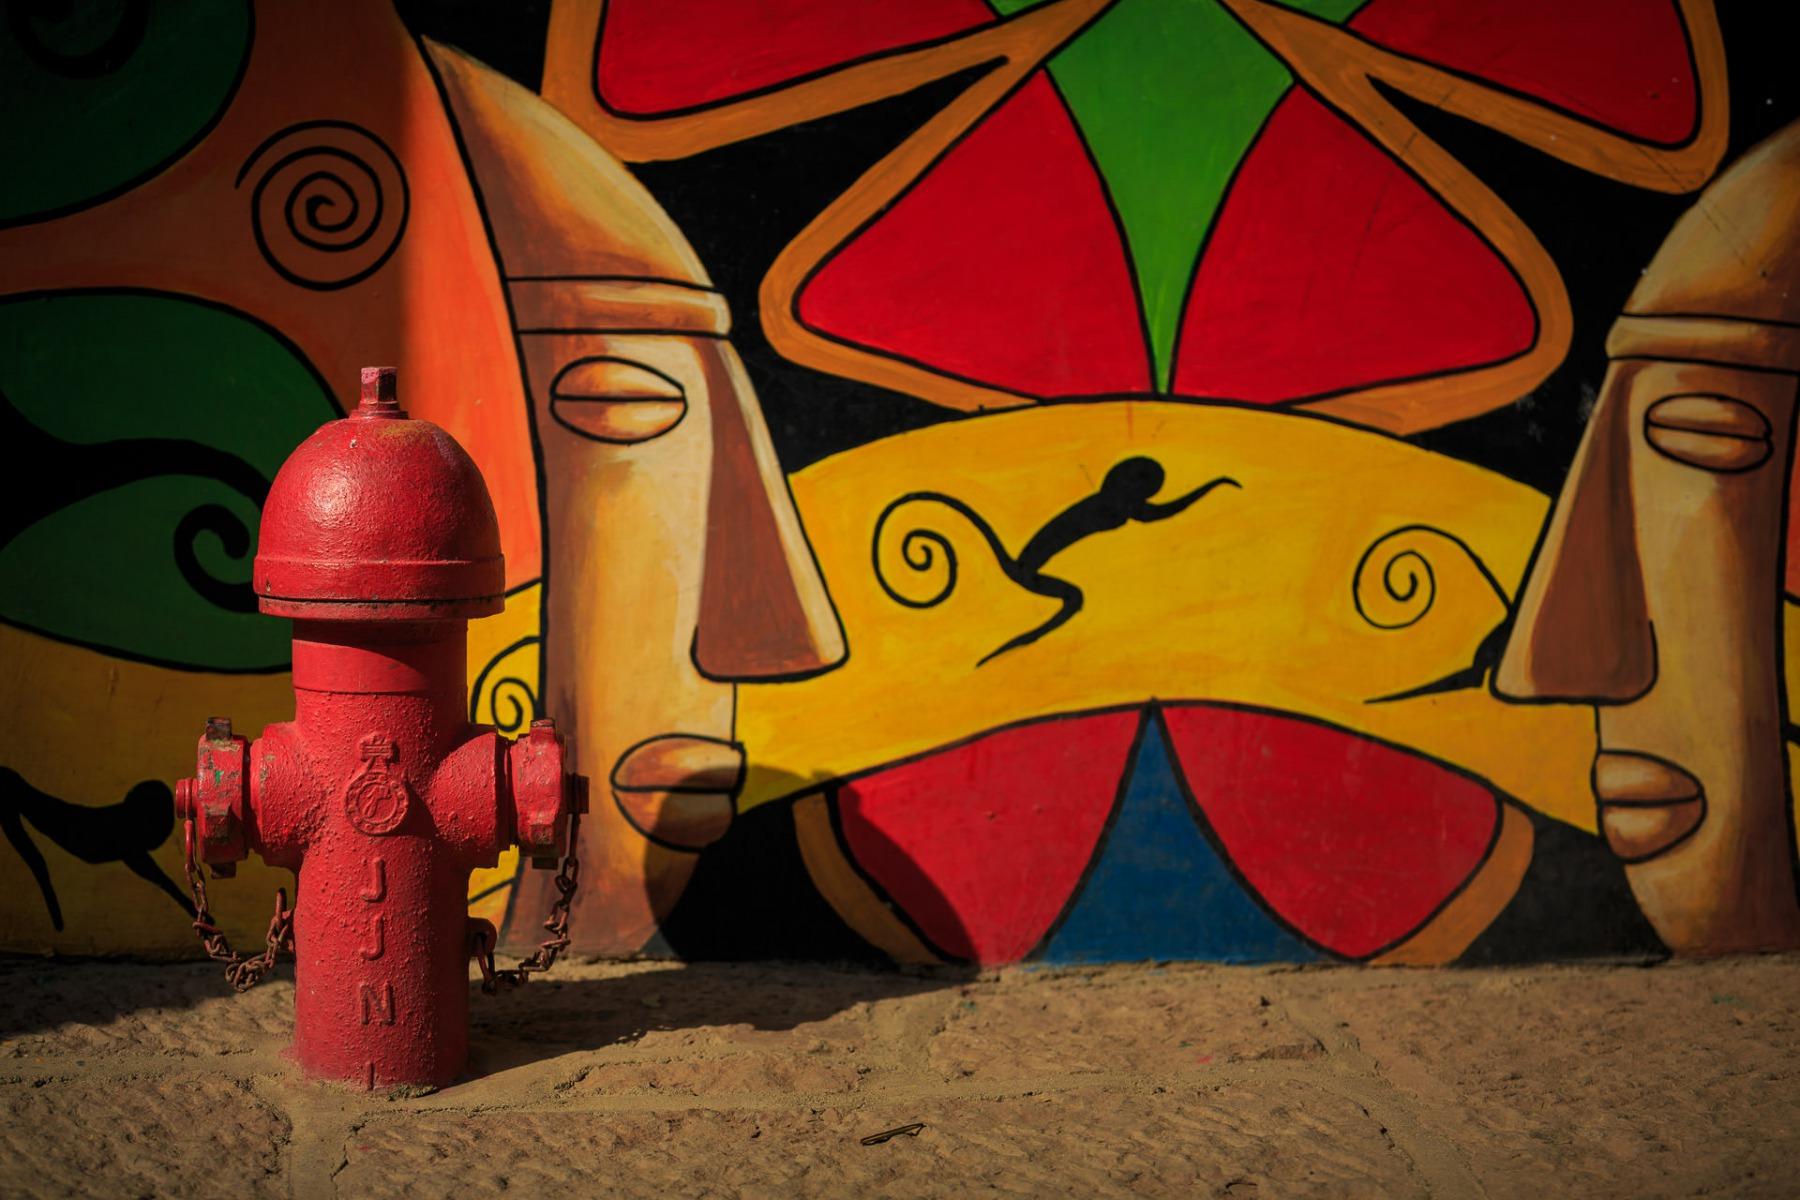 raquira boyaca colombia 5 © Tristan Quevilly